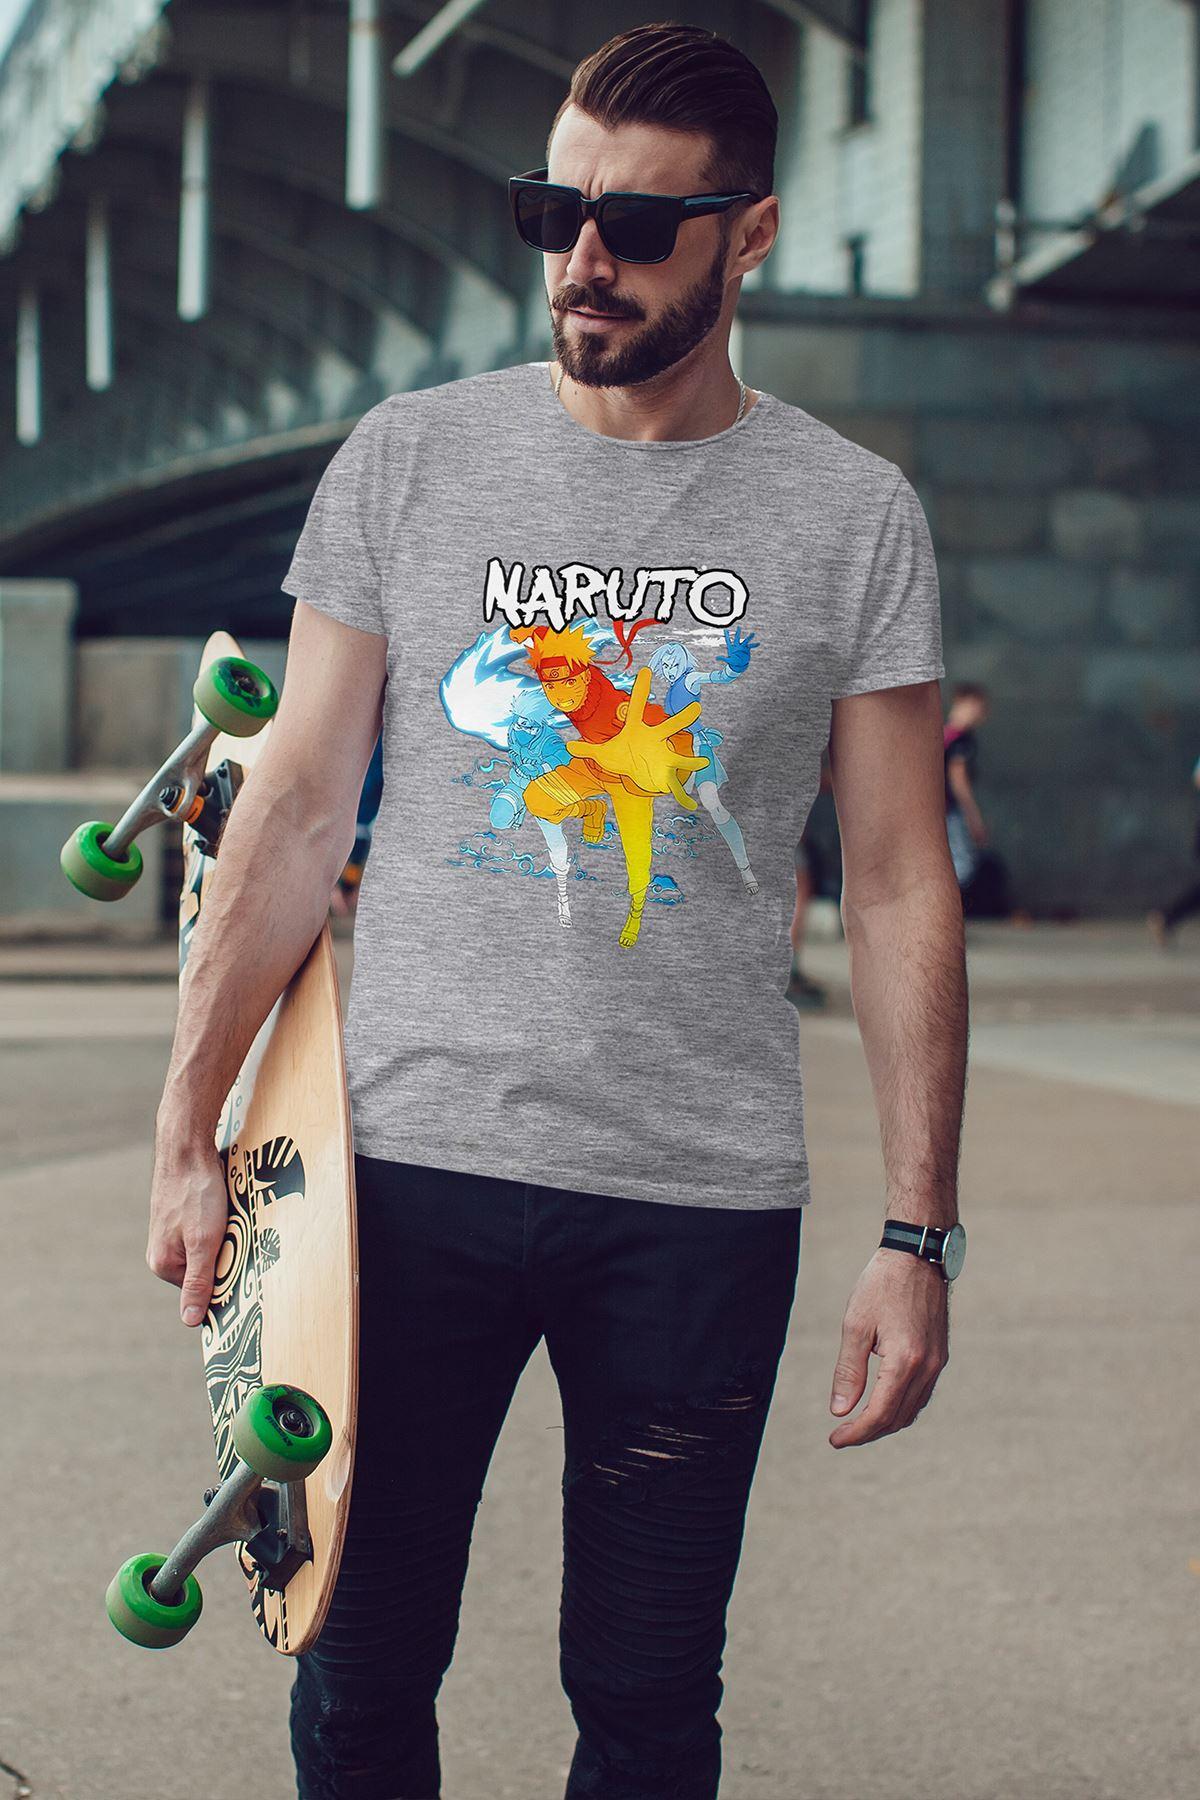 Naruto Anime 03 Gri Erkek Tshirt - Tişört